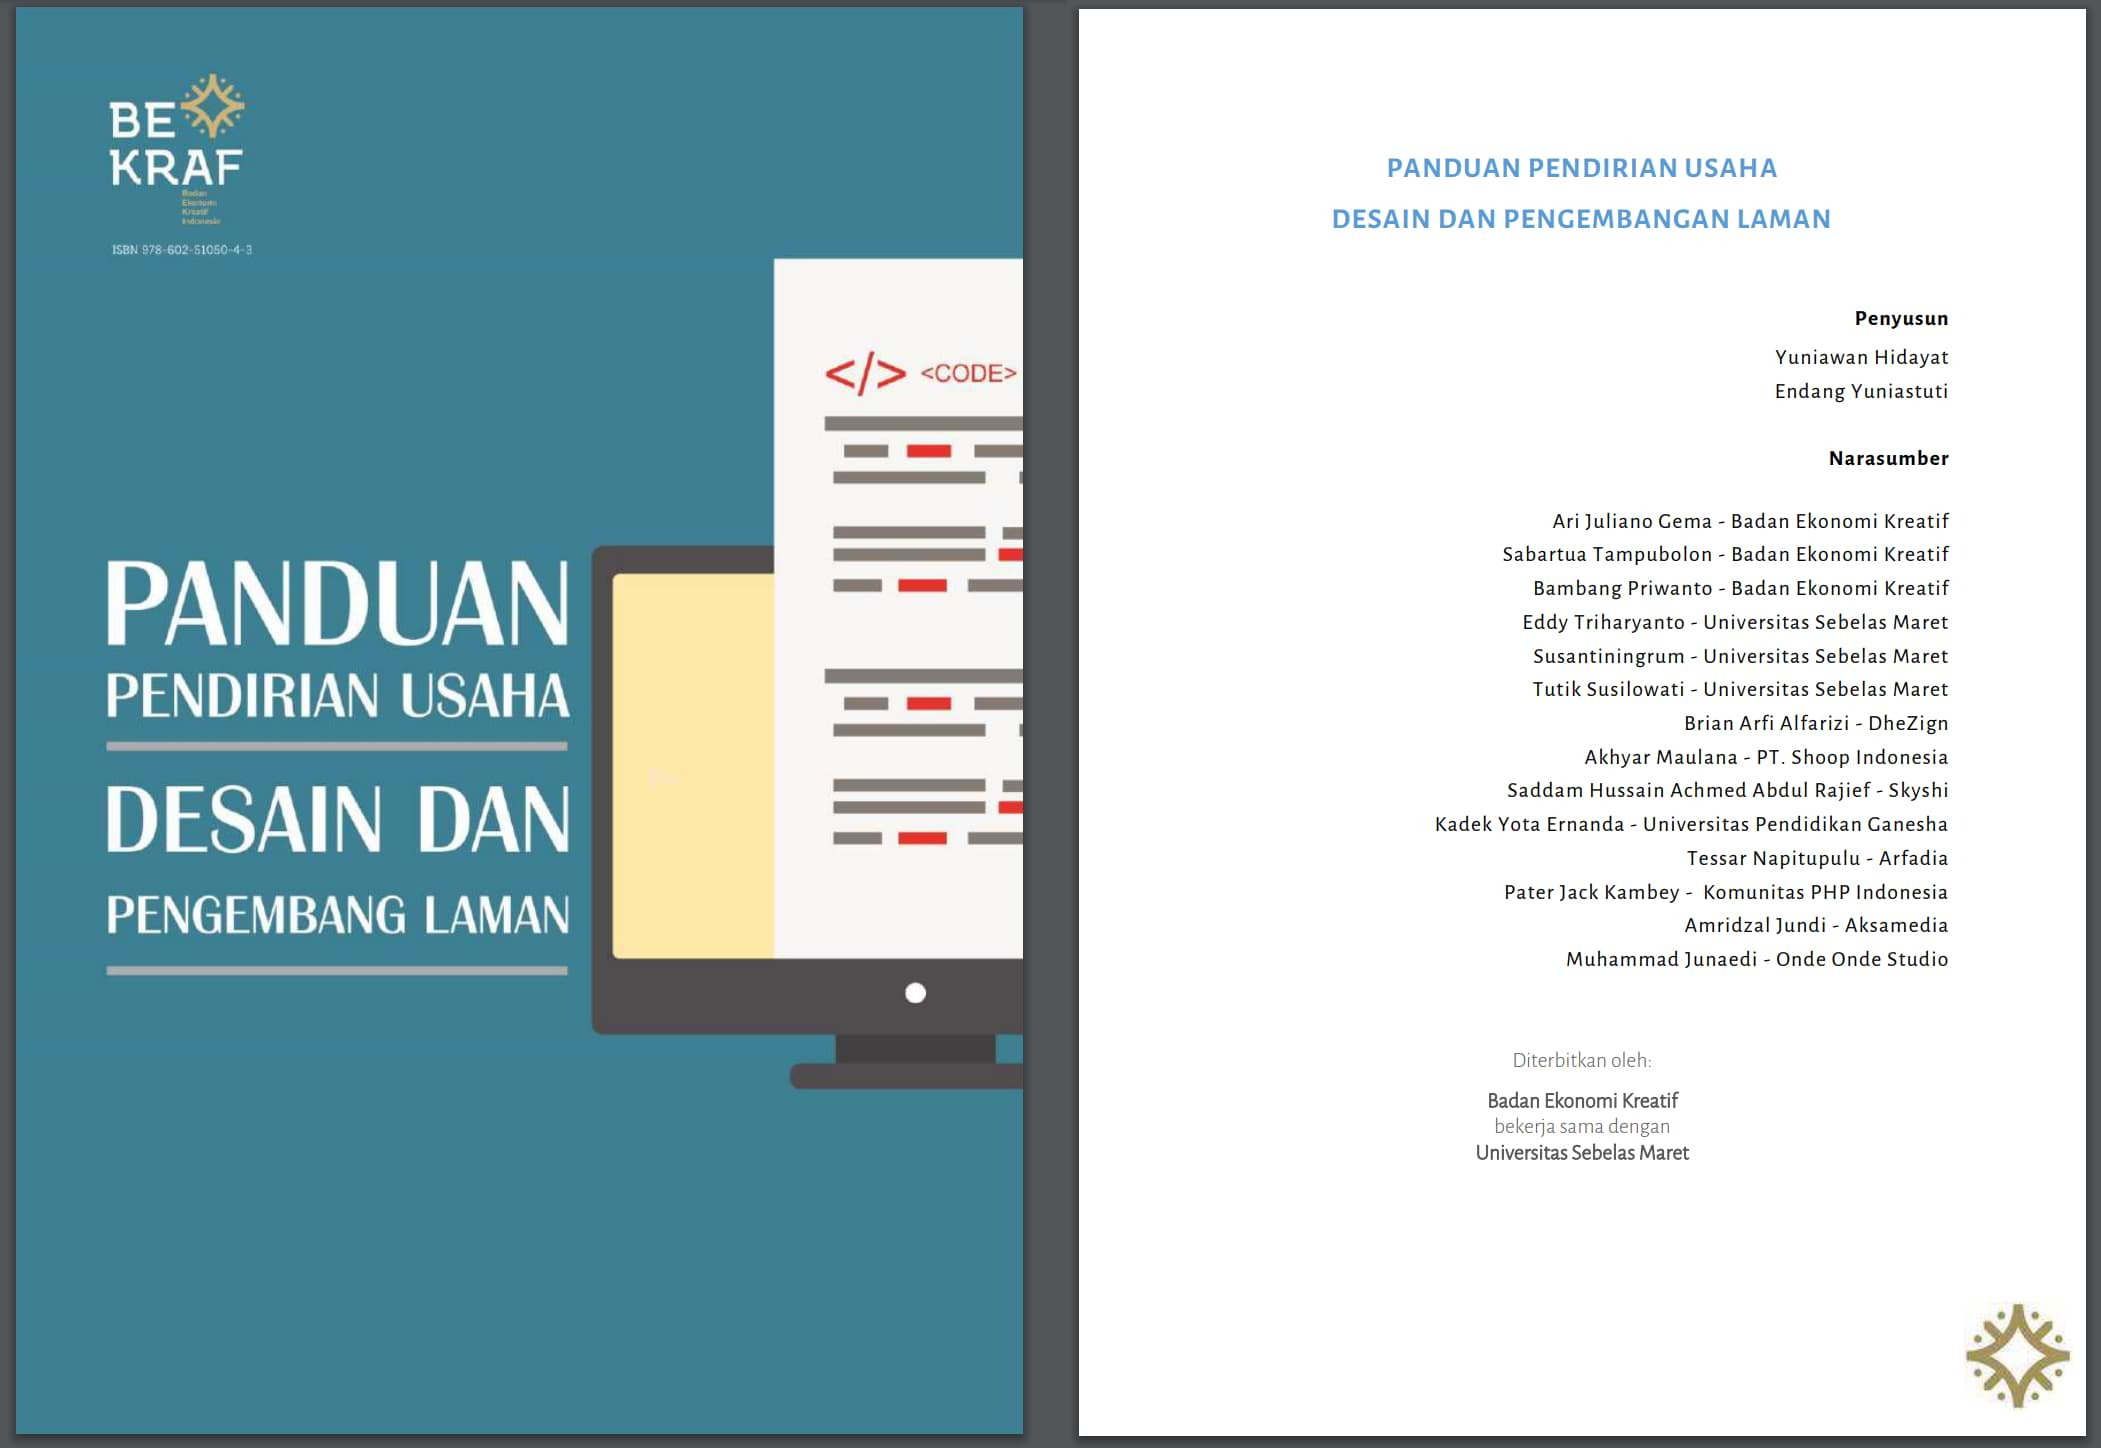 Buku Panduan Pendirian Usaha - Desain dan Pengembang Laman